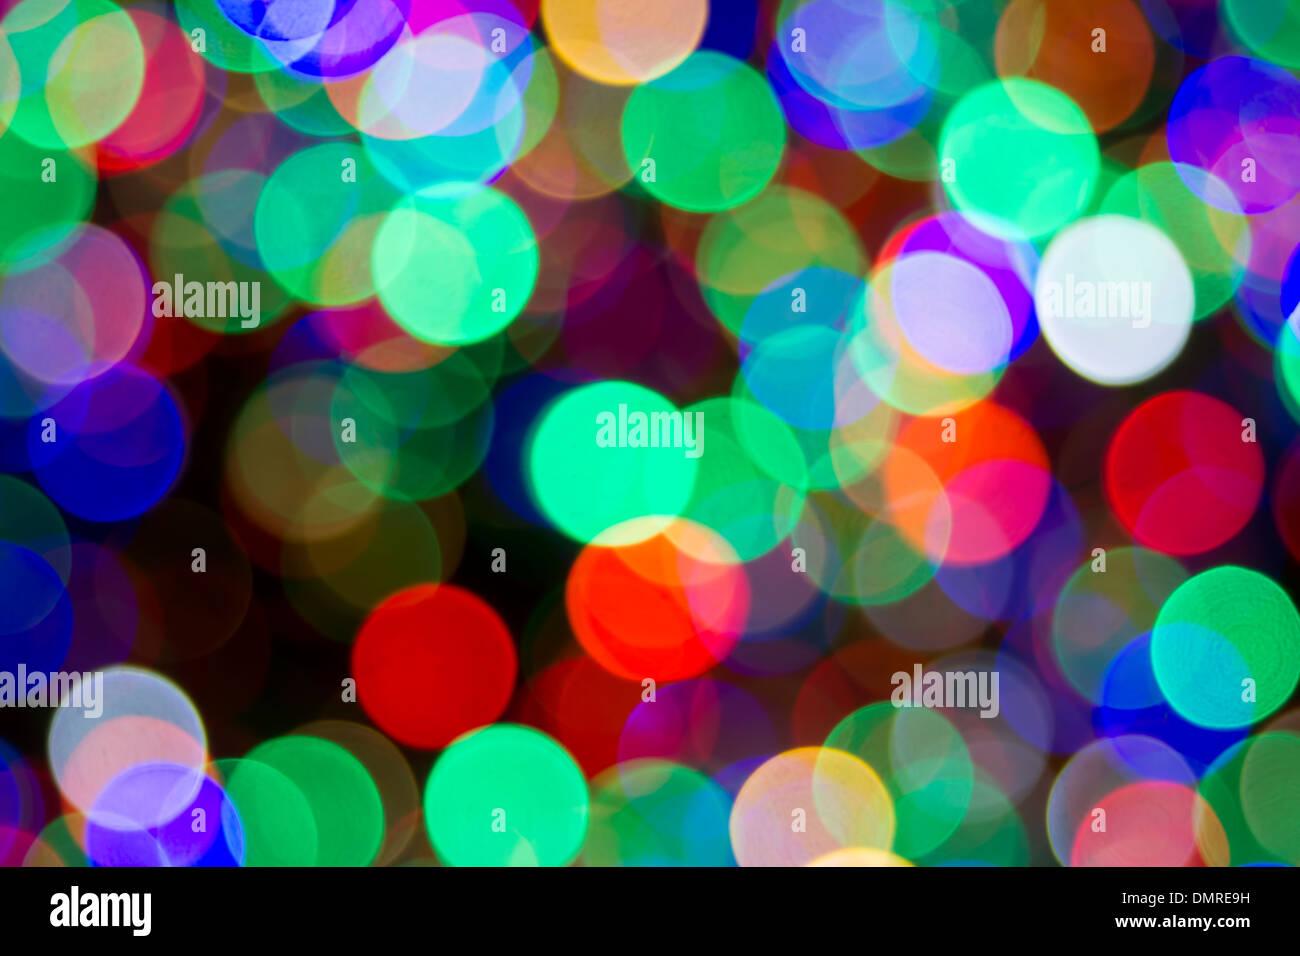 Christmas Tree Colorful Blinking Lights Blurred Defocused Bokeh Background - Stock Image